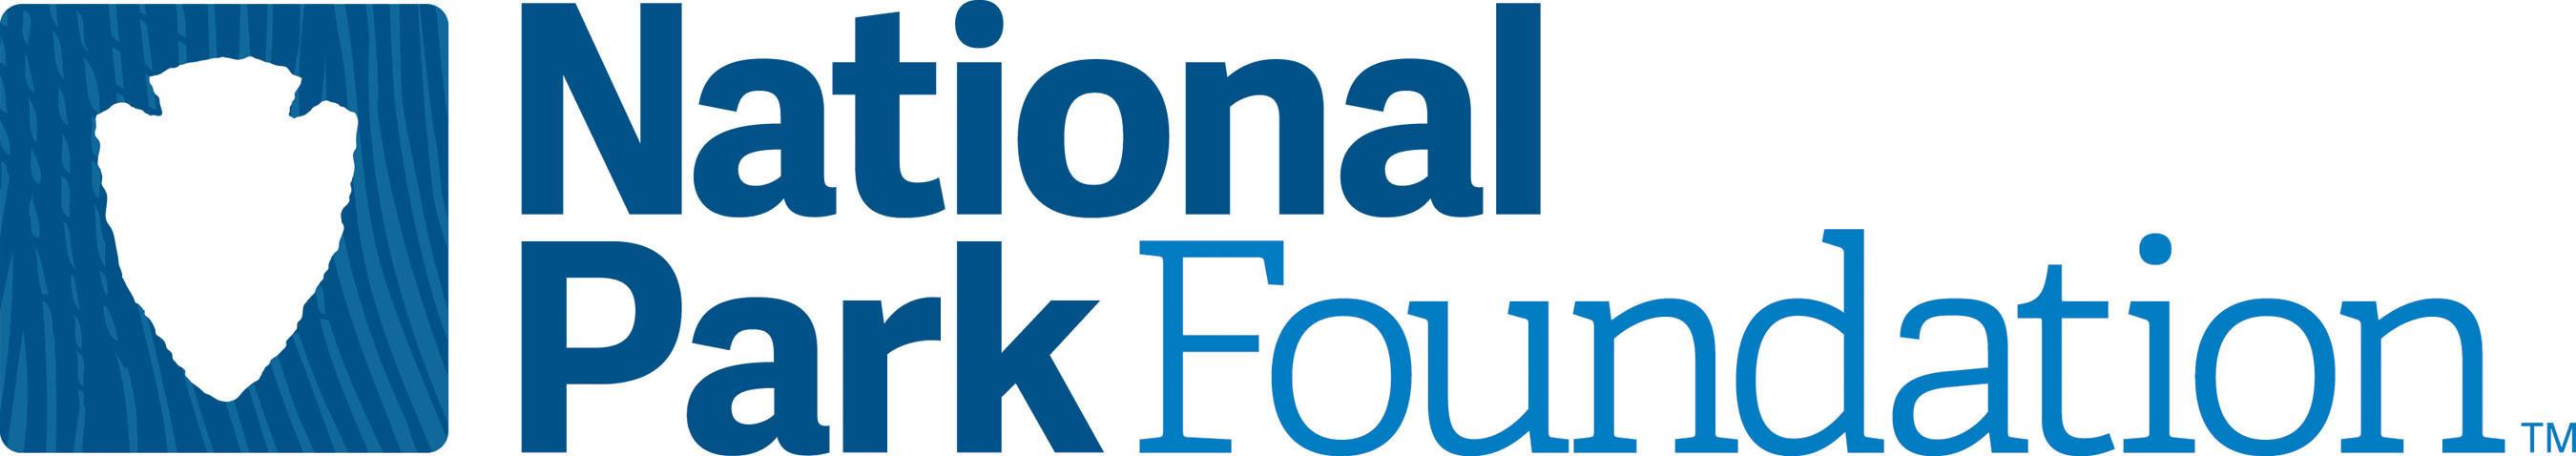 National Park Foundation.